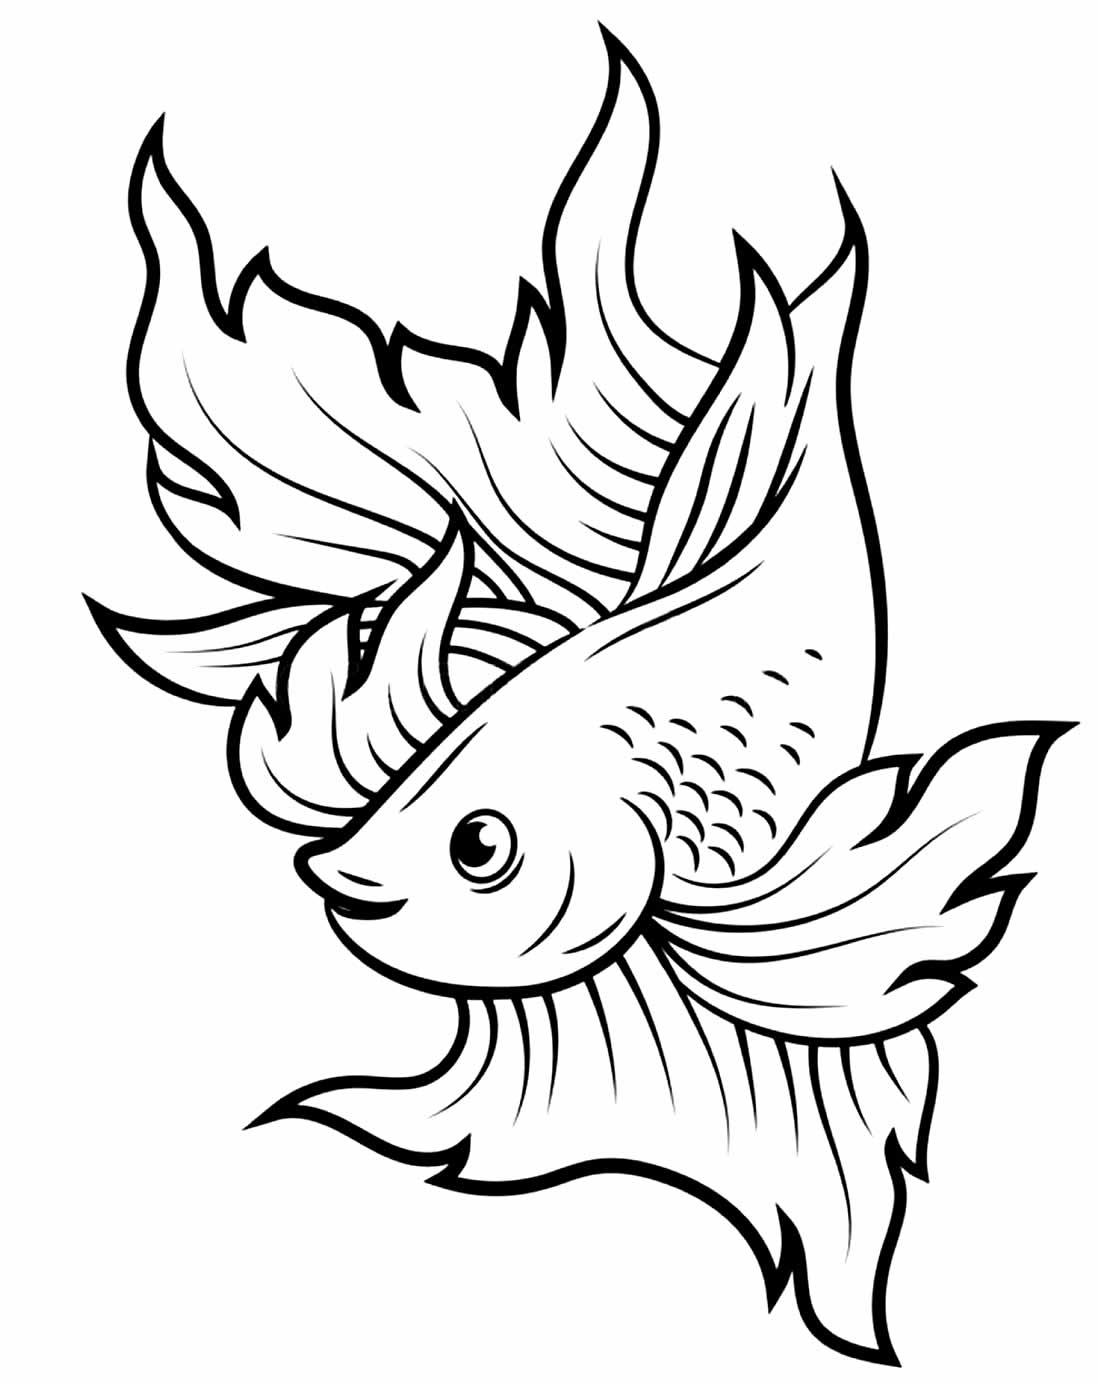 Imagem de peixe para colorir